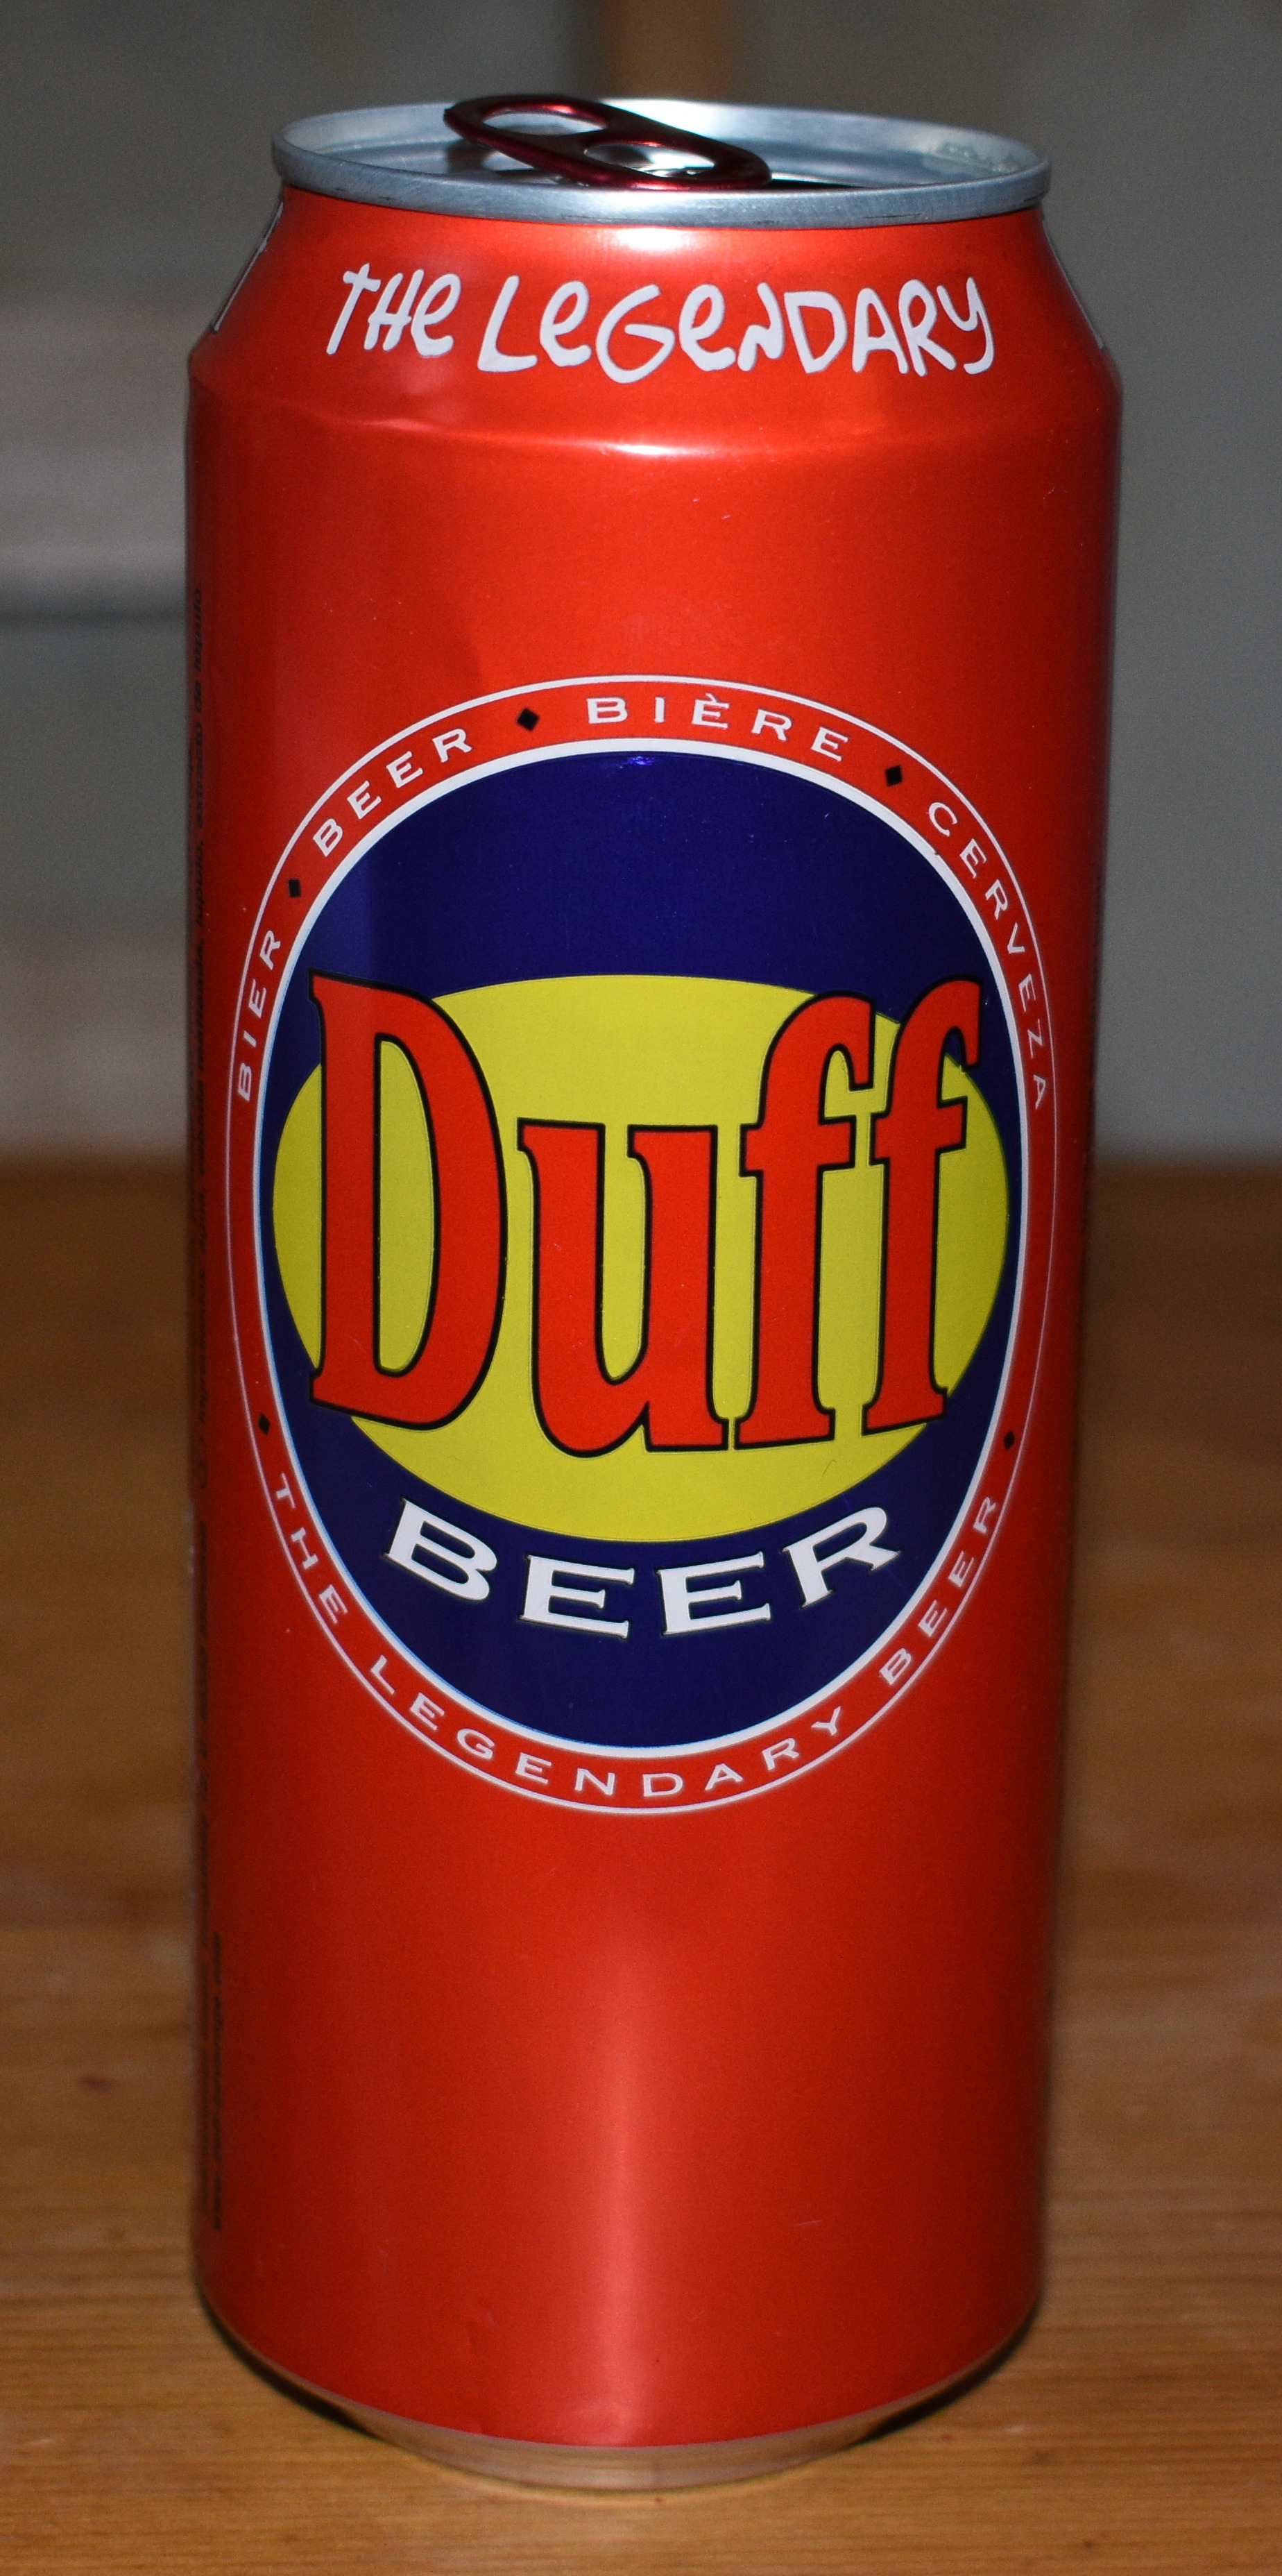 Duff Beer - Wikipedia